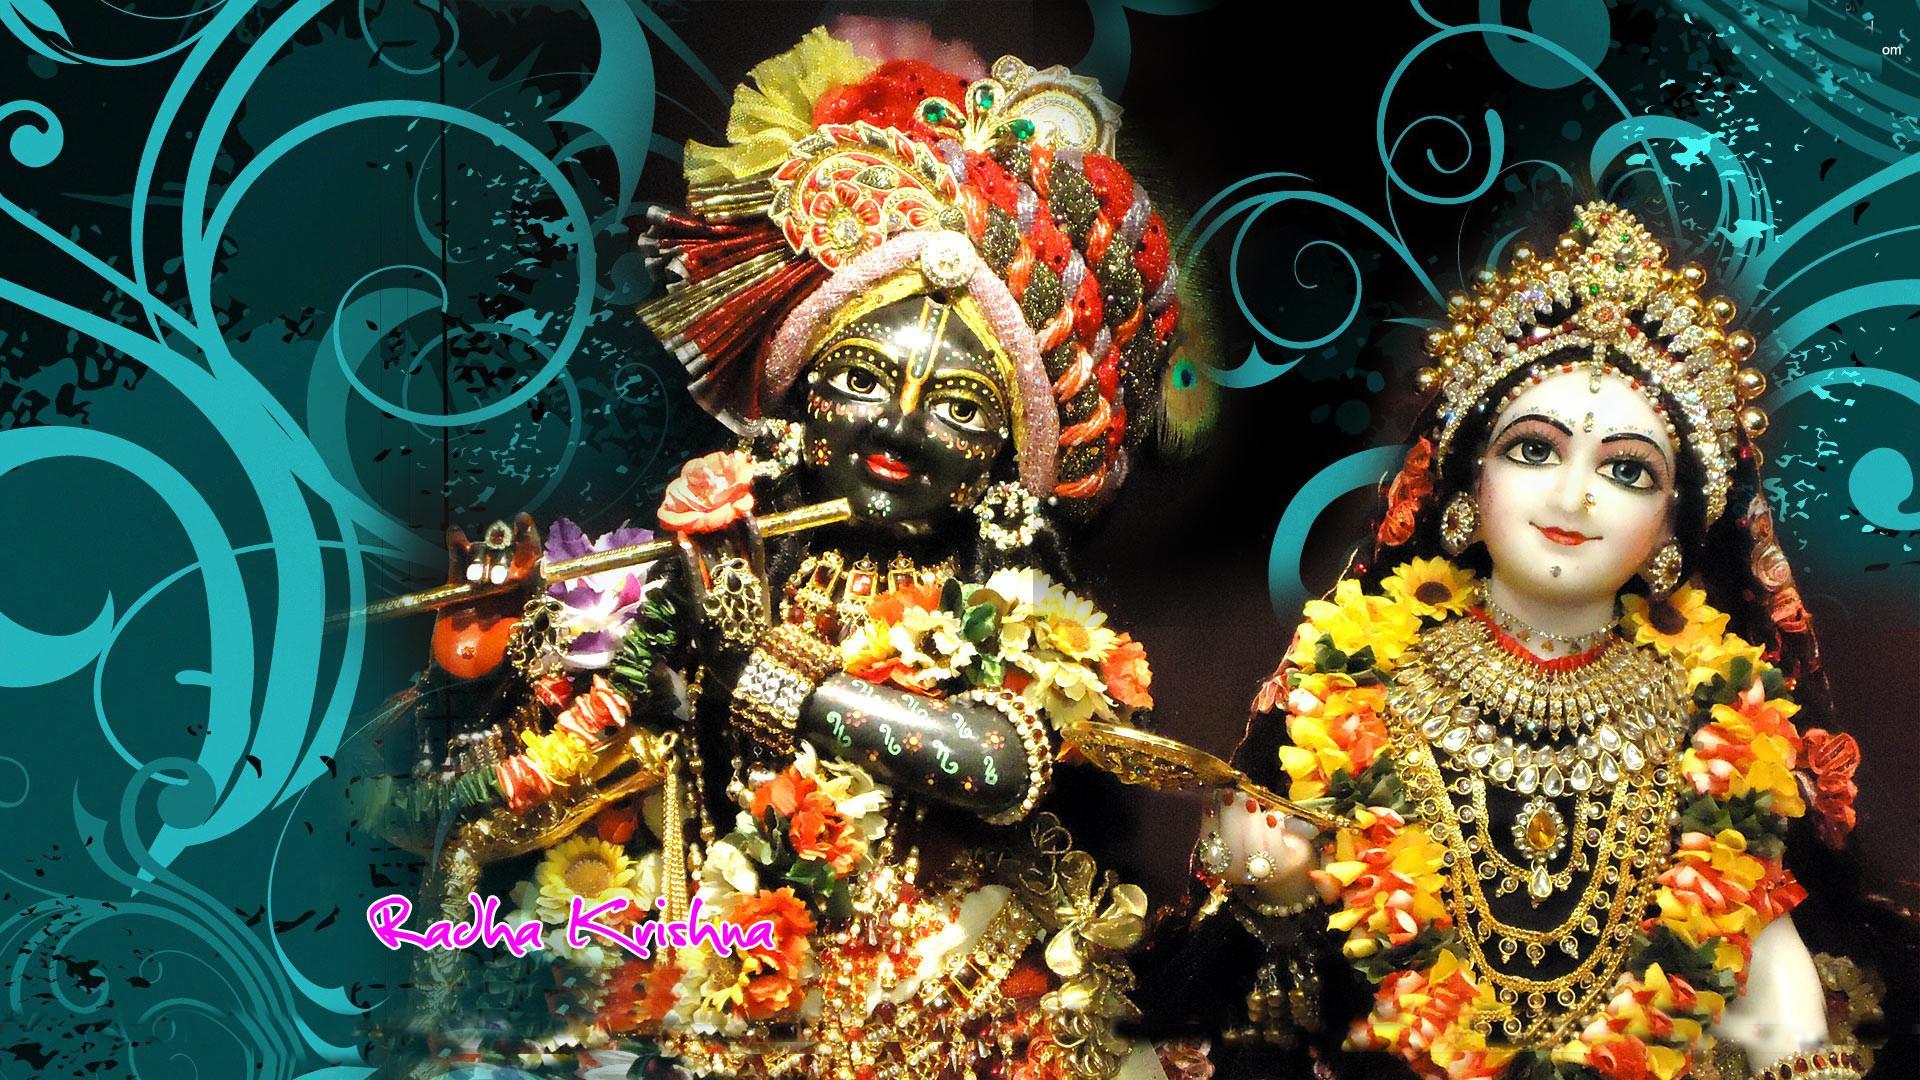 Download Lord Krishna wallpaper images65